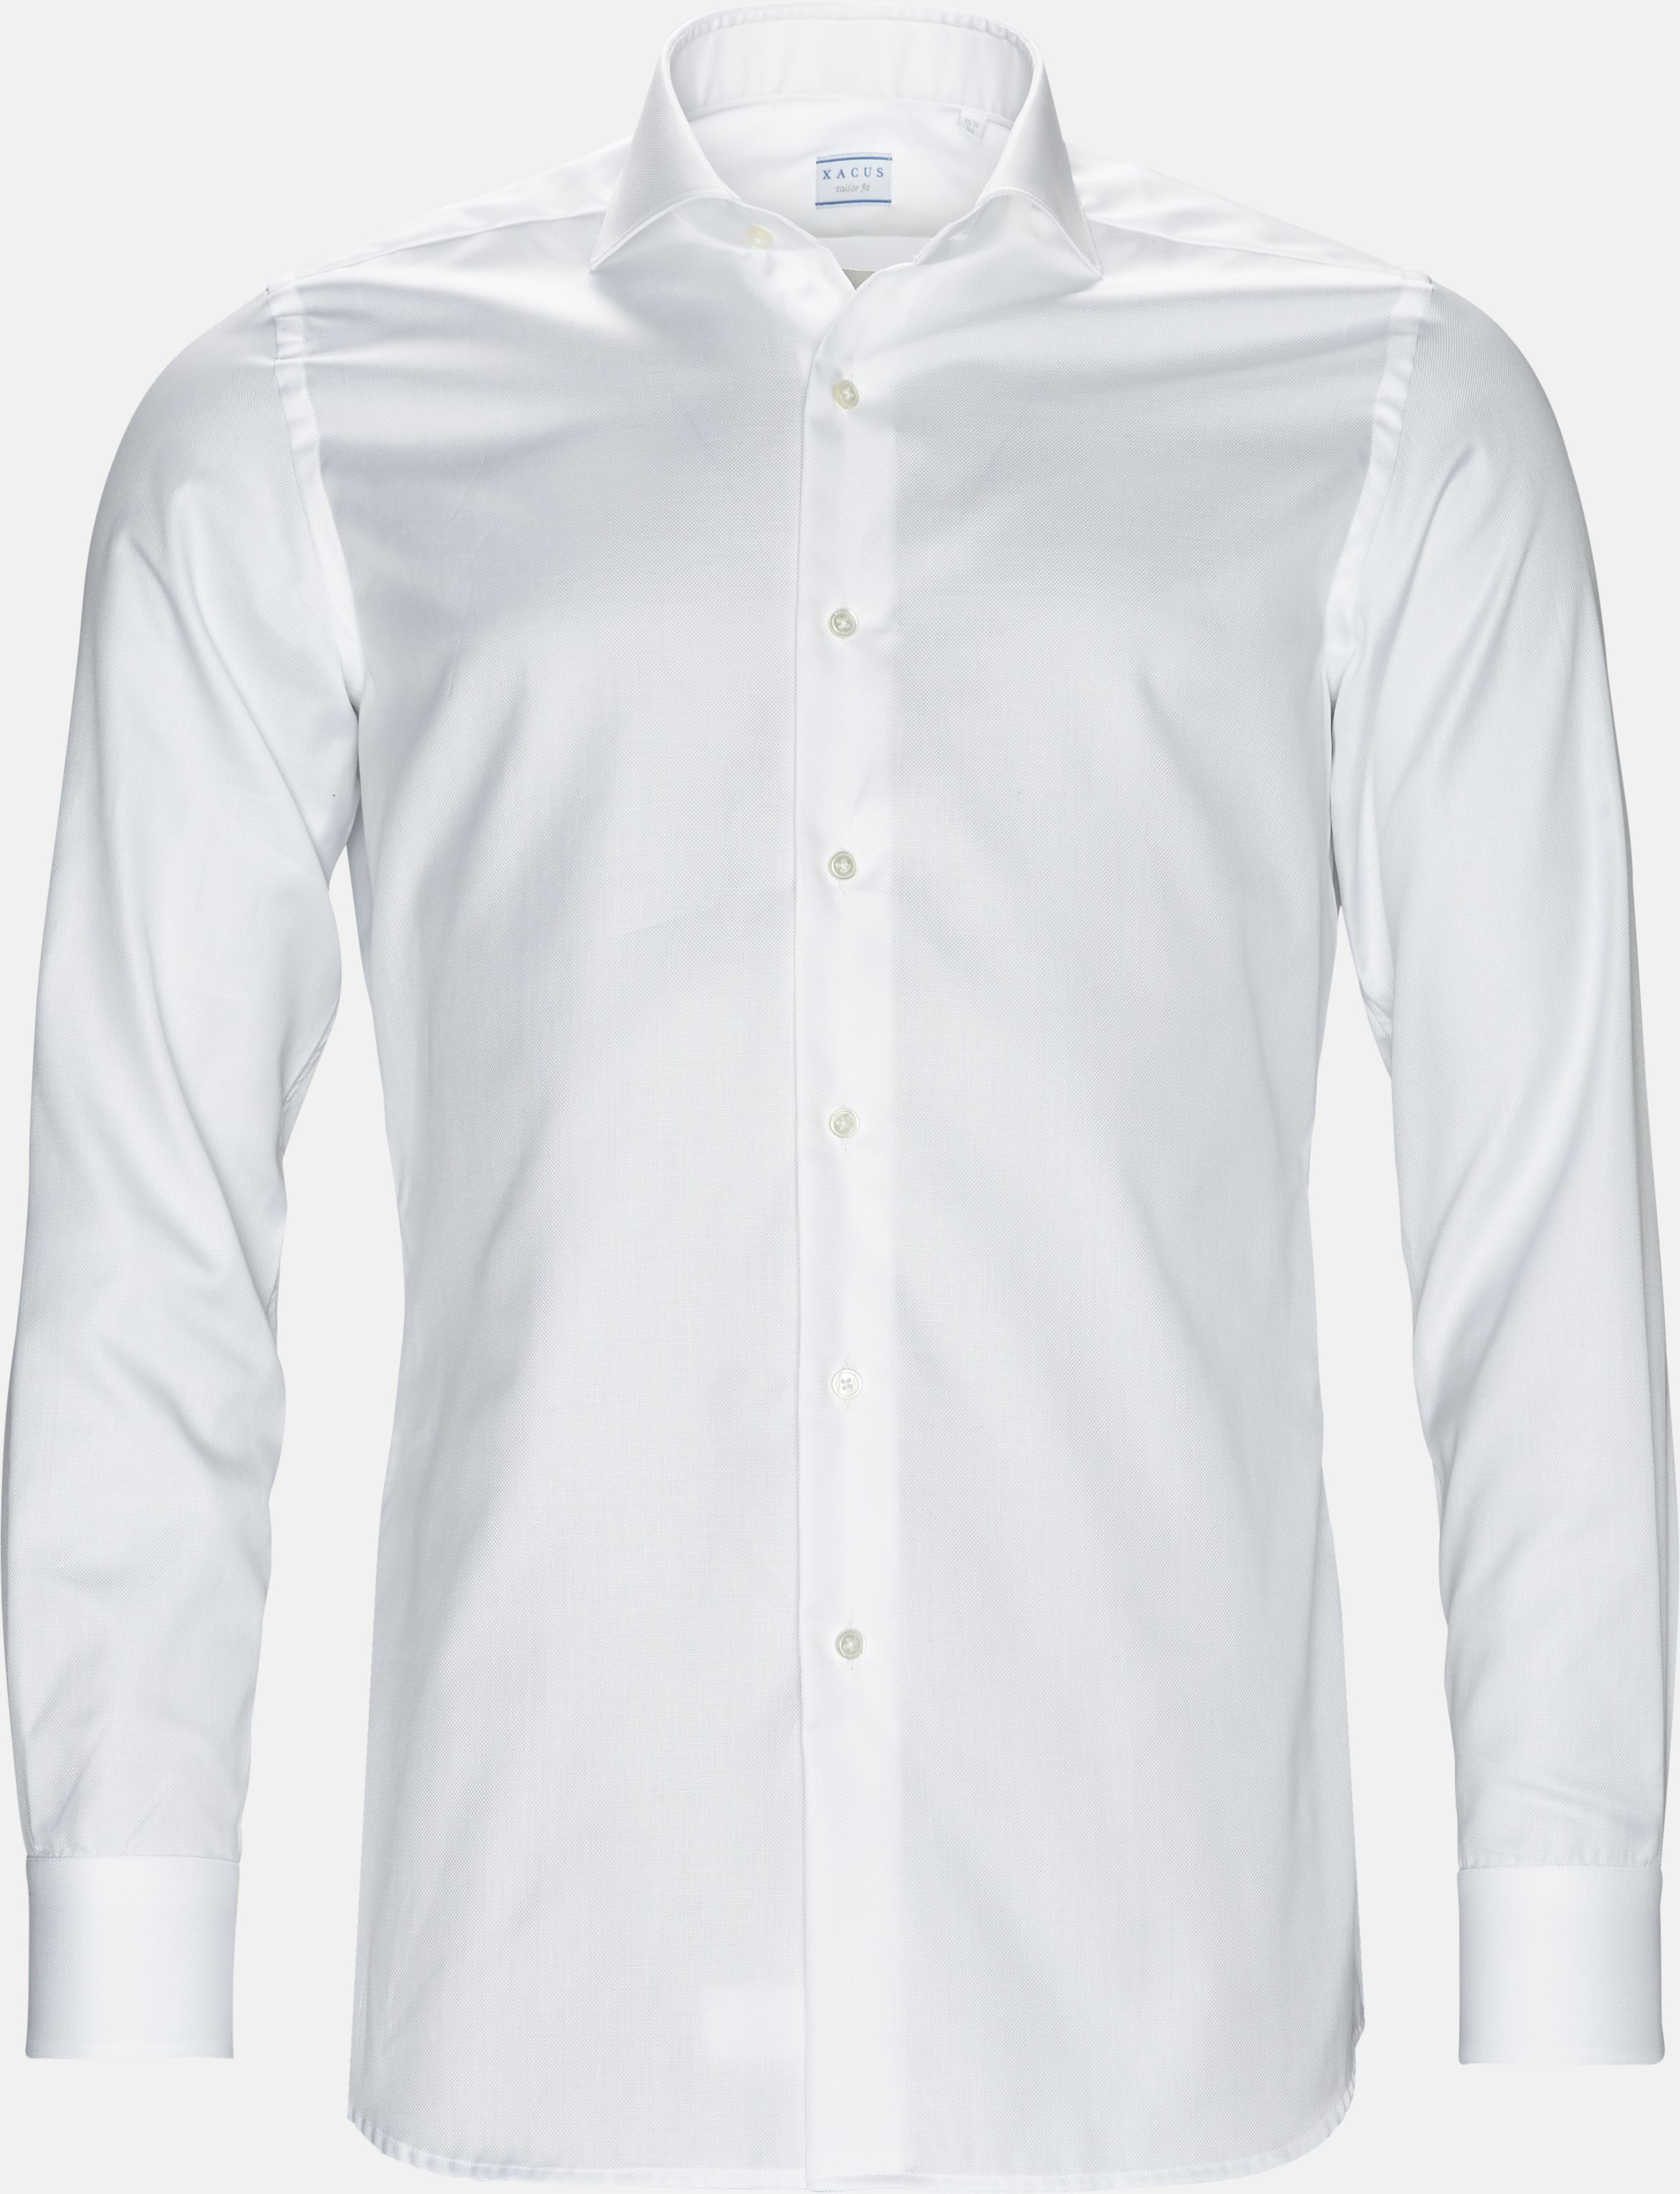 11313 526 skjorte - Skjorter - Contemporary fit - Hvid